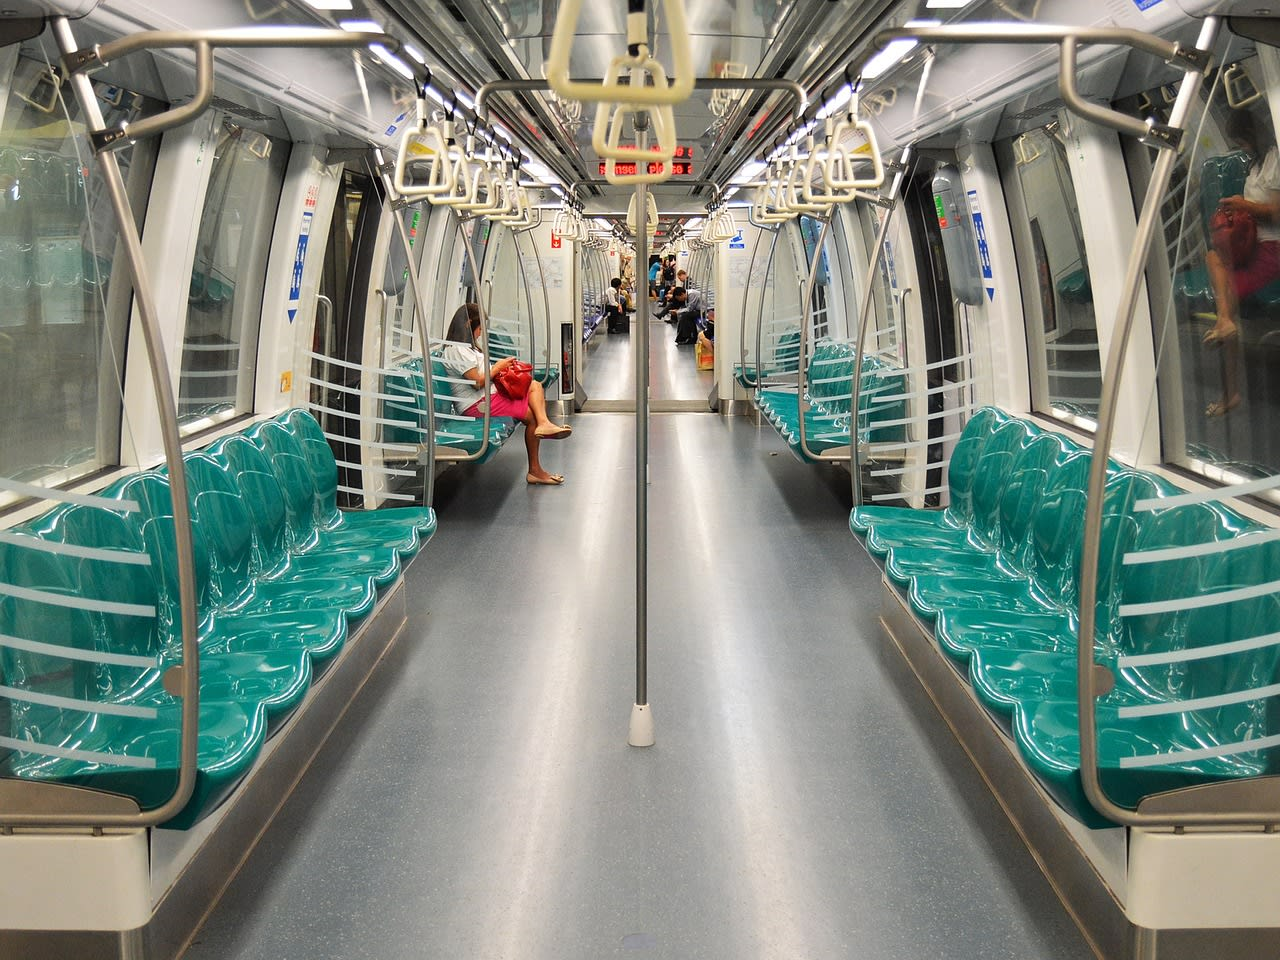 cap nhat kinh nghiem di singapore dung quen mang theo transport card3